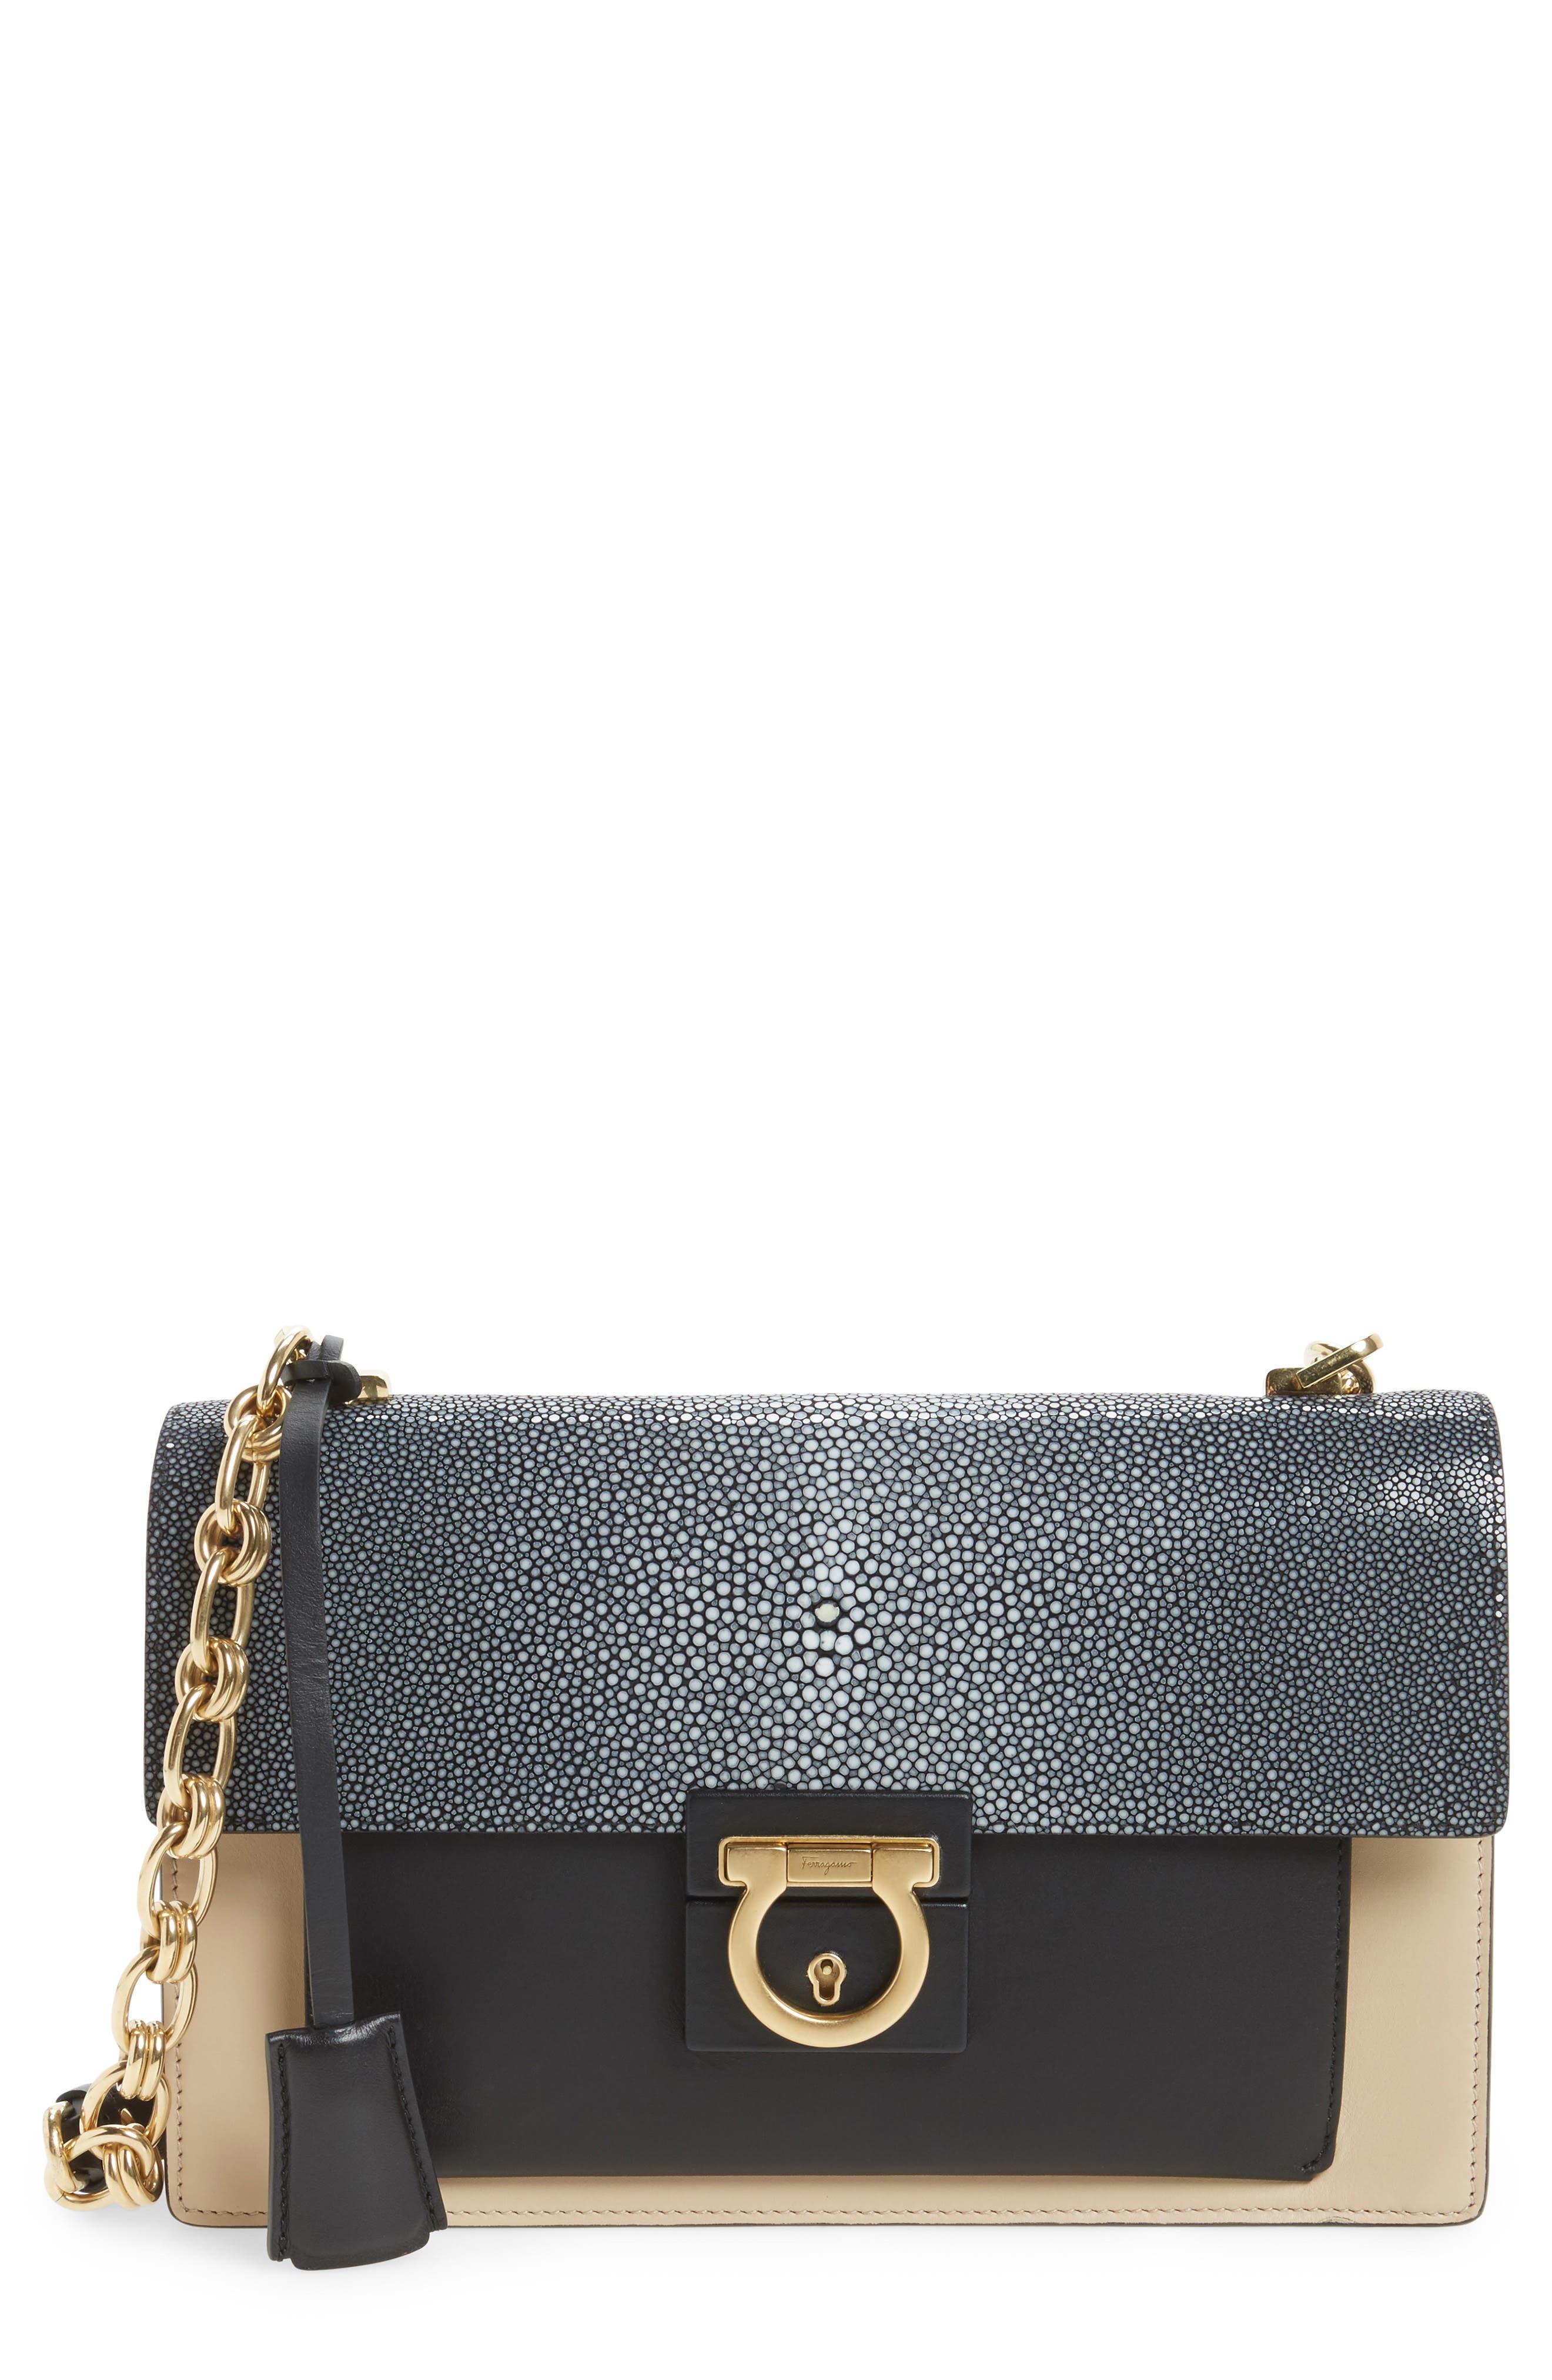 SALVATORE FERRAGAMO Stingray Leather Shoulder Bag, Main, color, 974